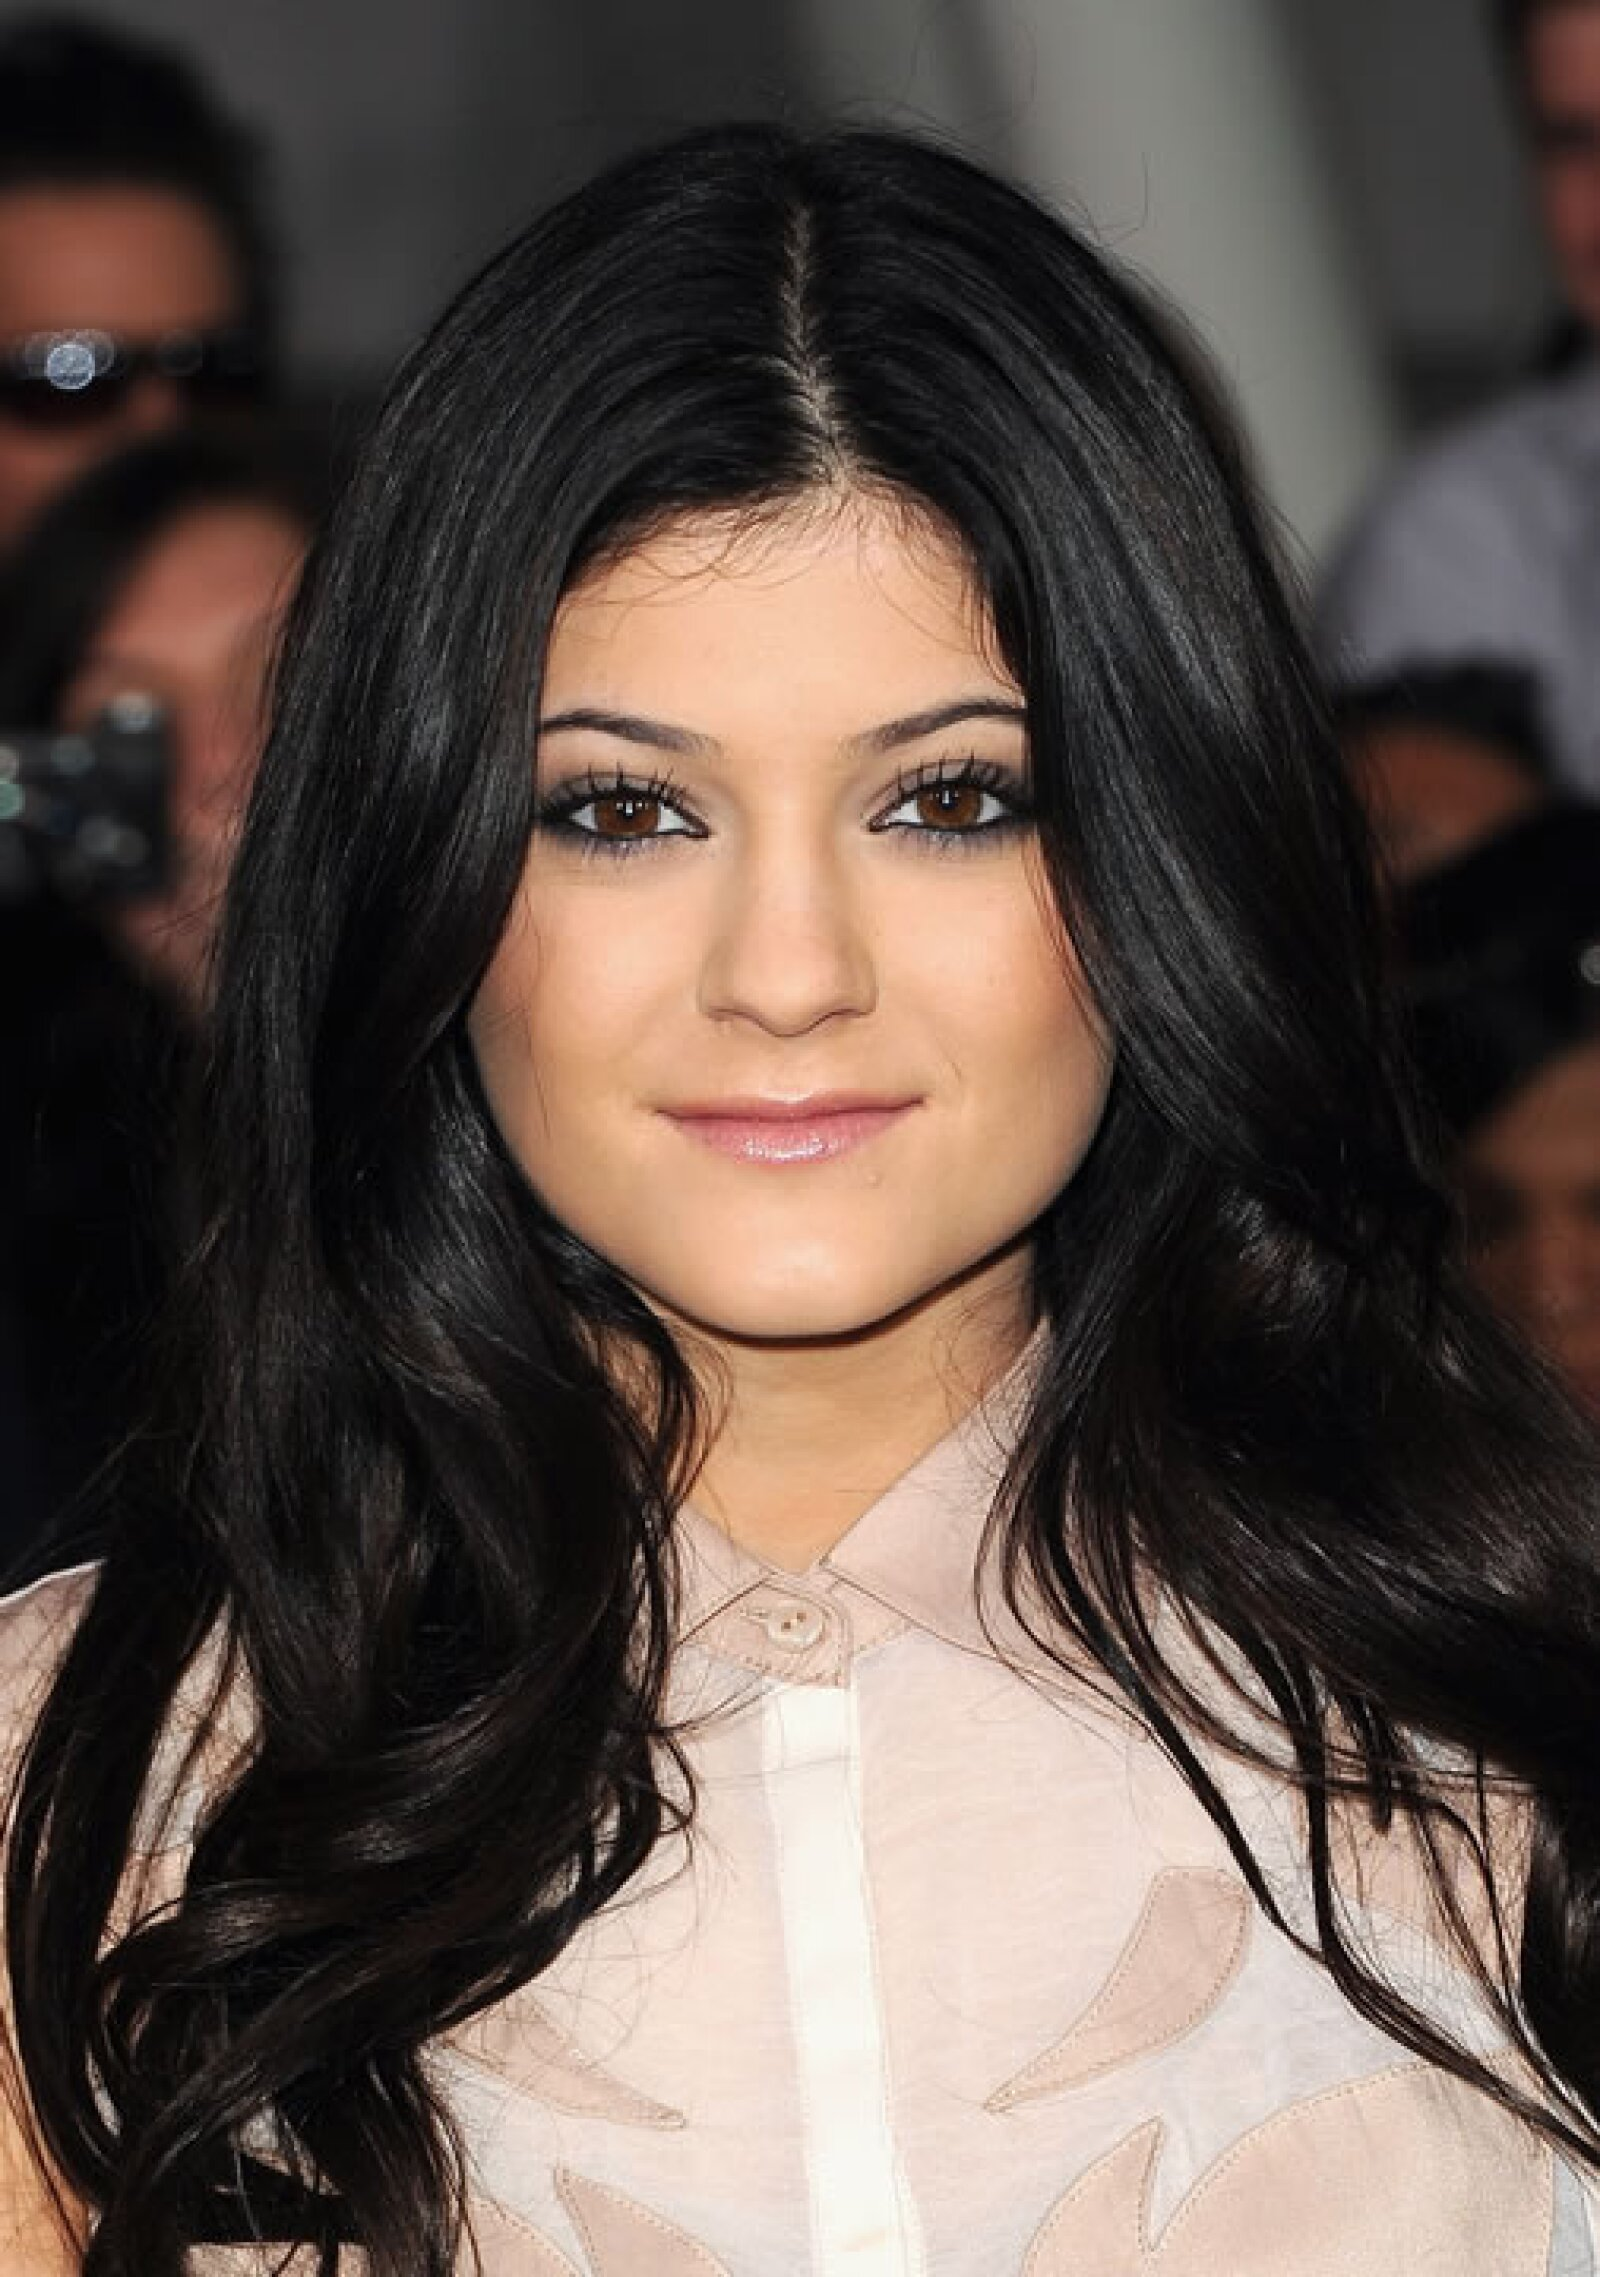 Kylie Jenner.